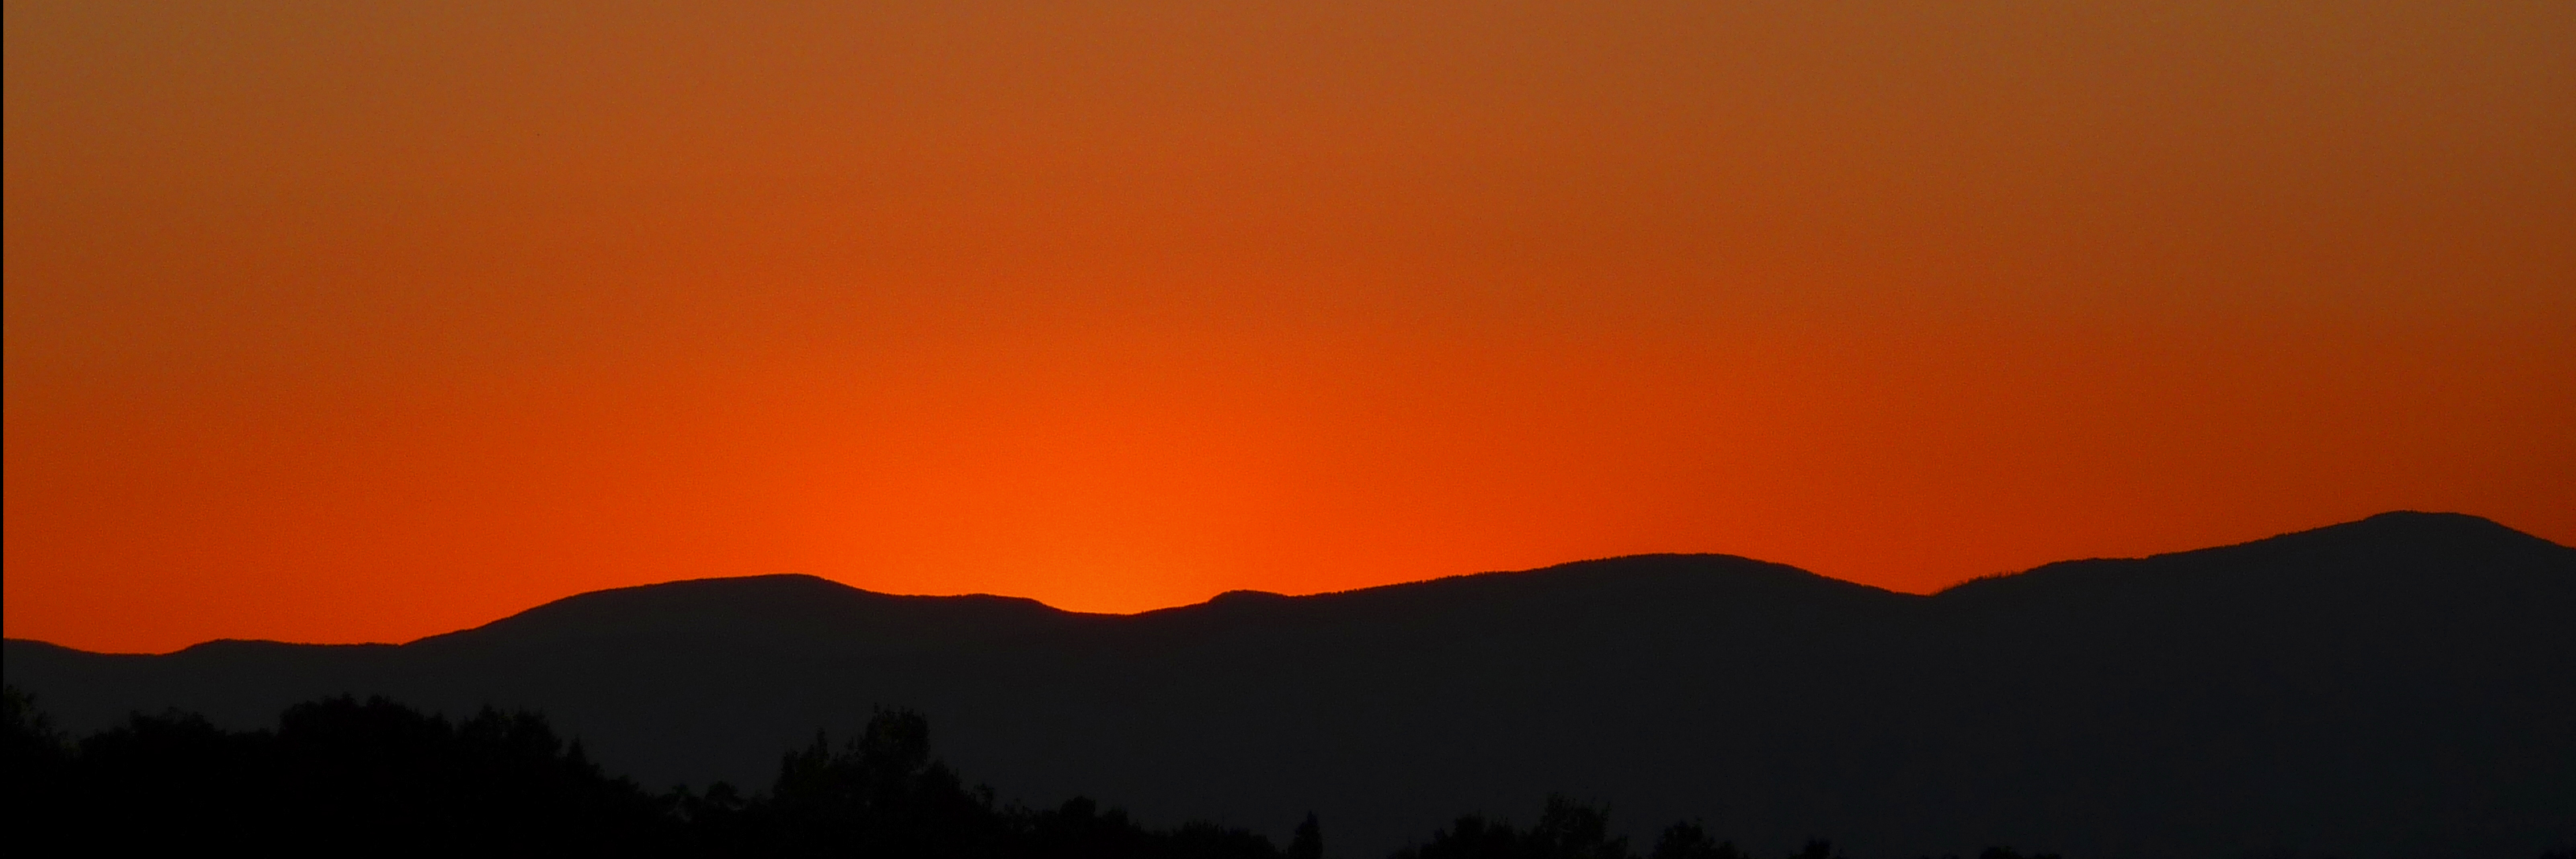 sunset 10x30